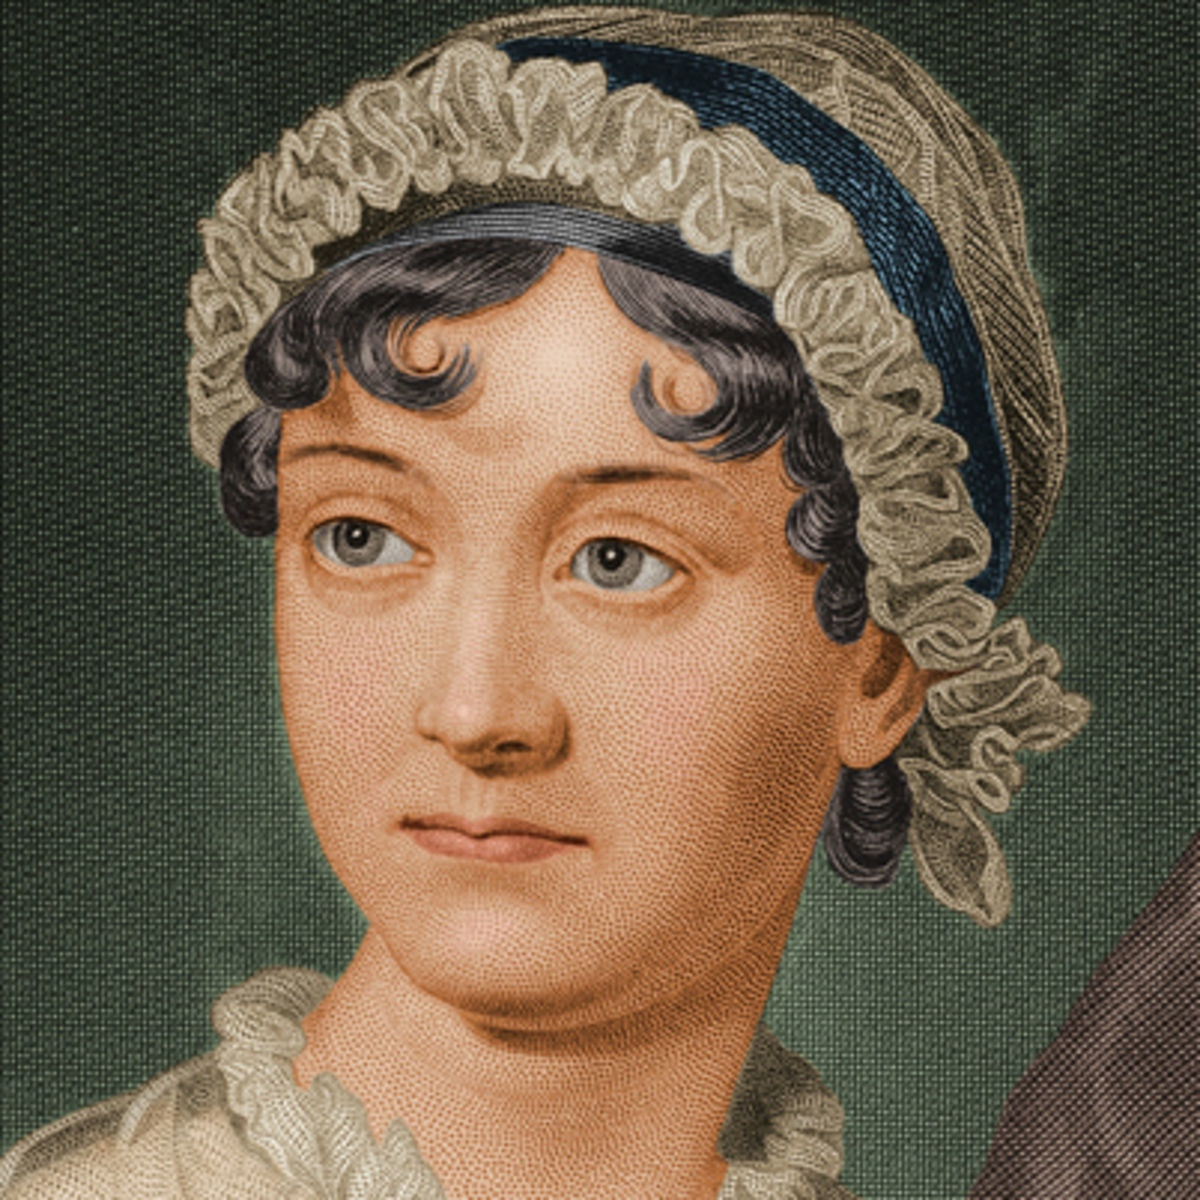 Jane Austen image 490 mb.jpg